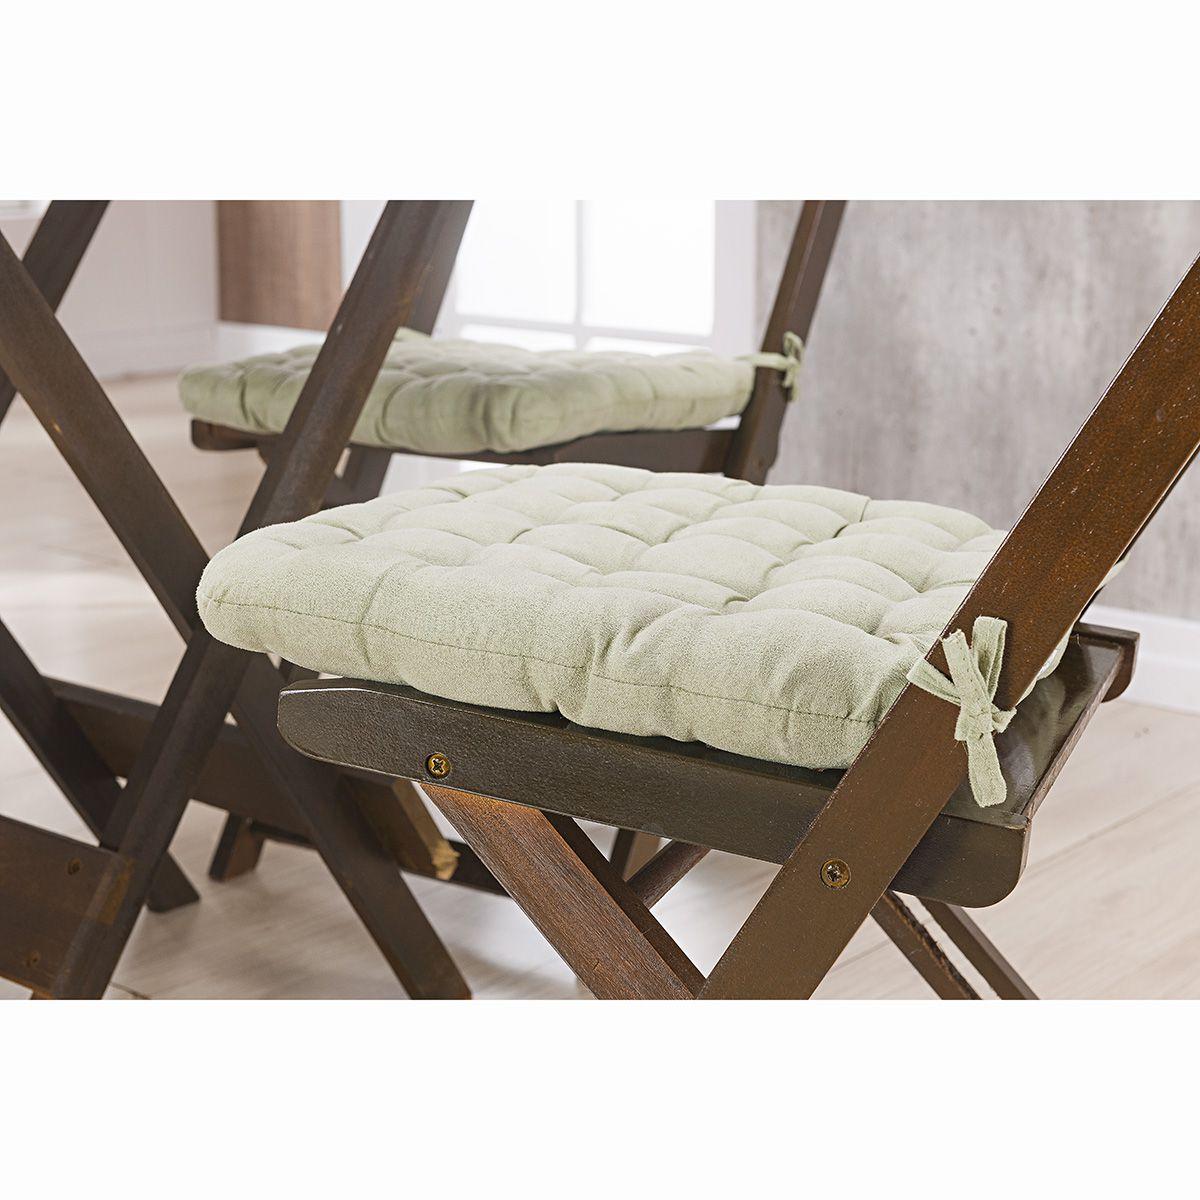 Assento P/ Cadeira - Futton - Kalamar - 40cm x 40cm - Verde - Niazitex